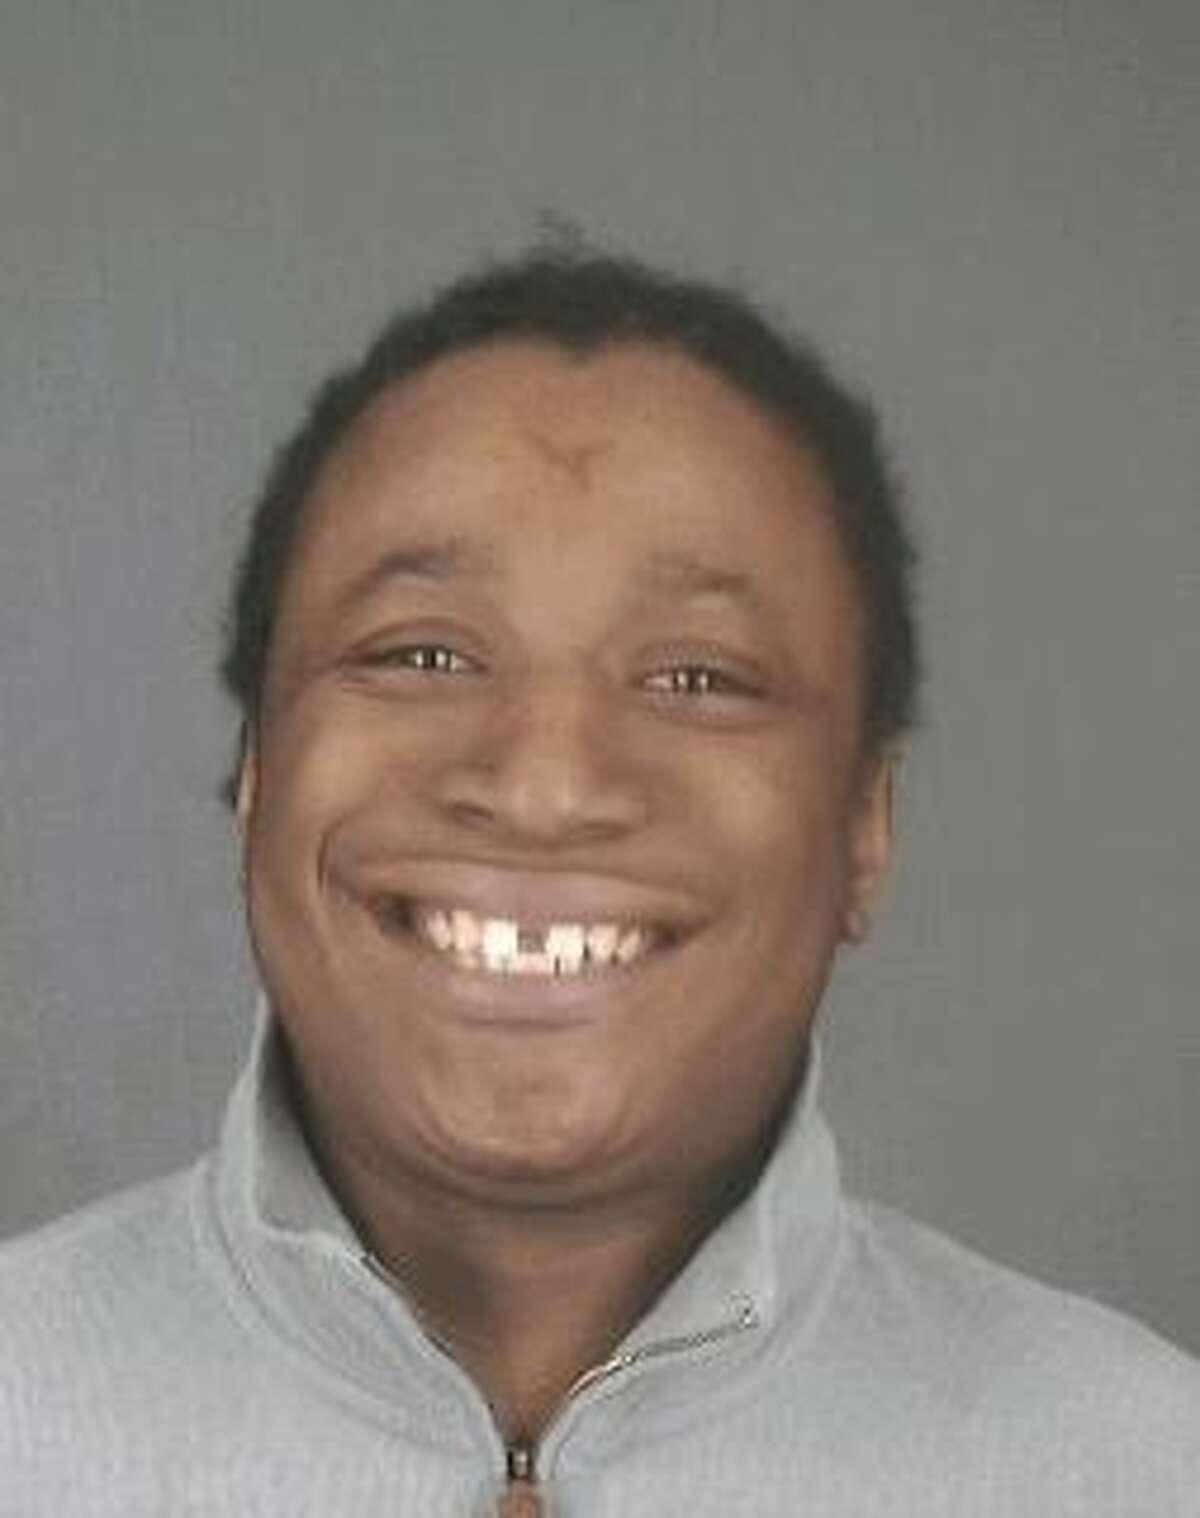 Rahkiem Johnson (Albany police photo)